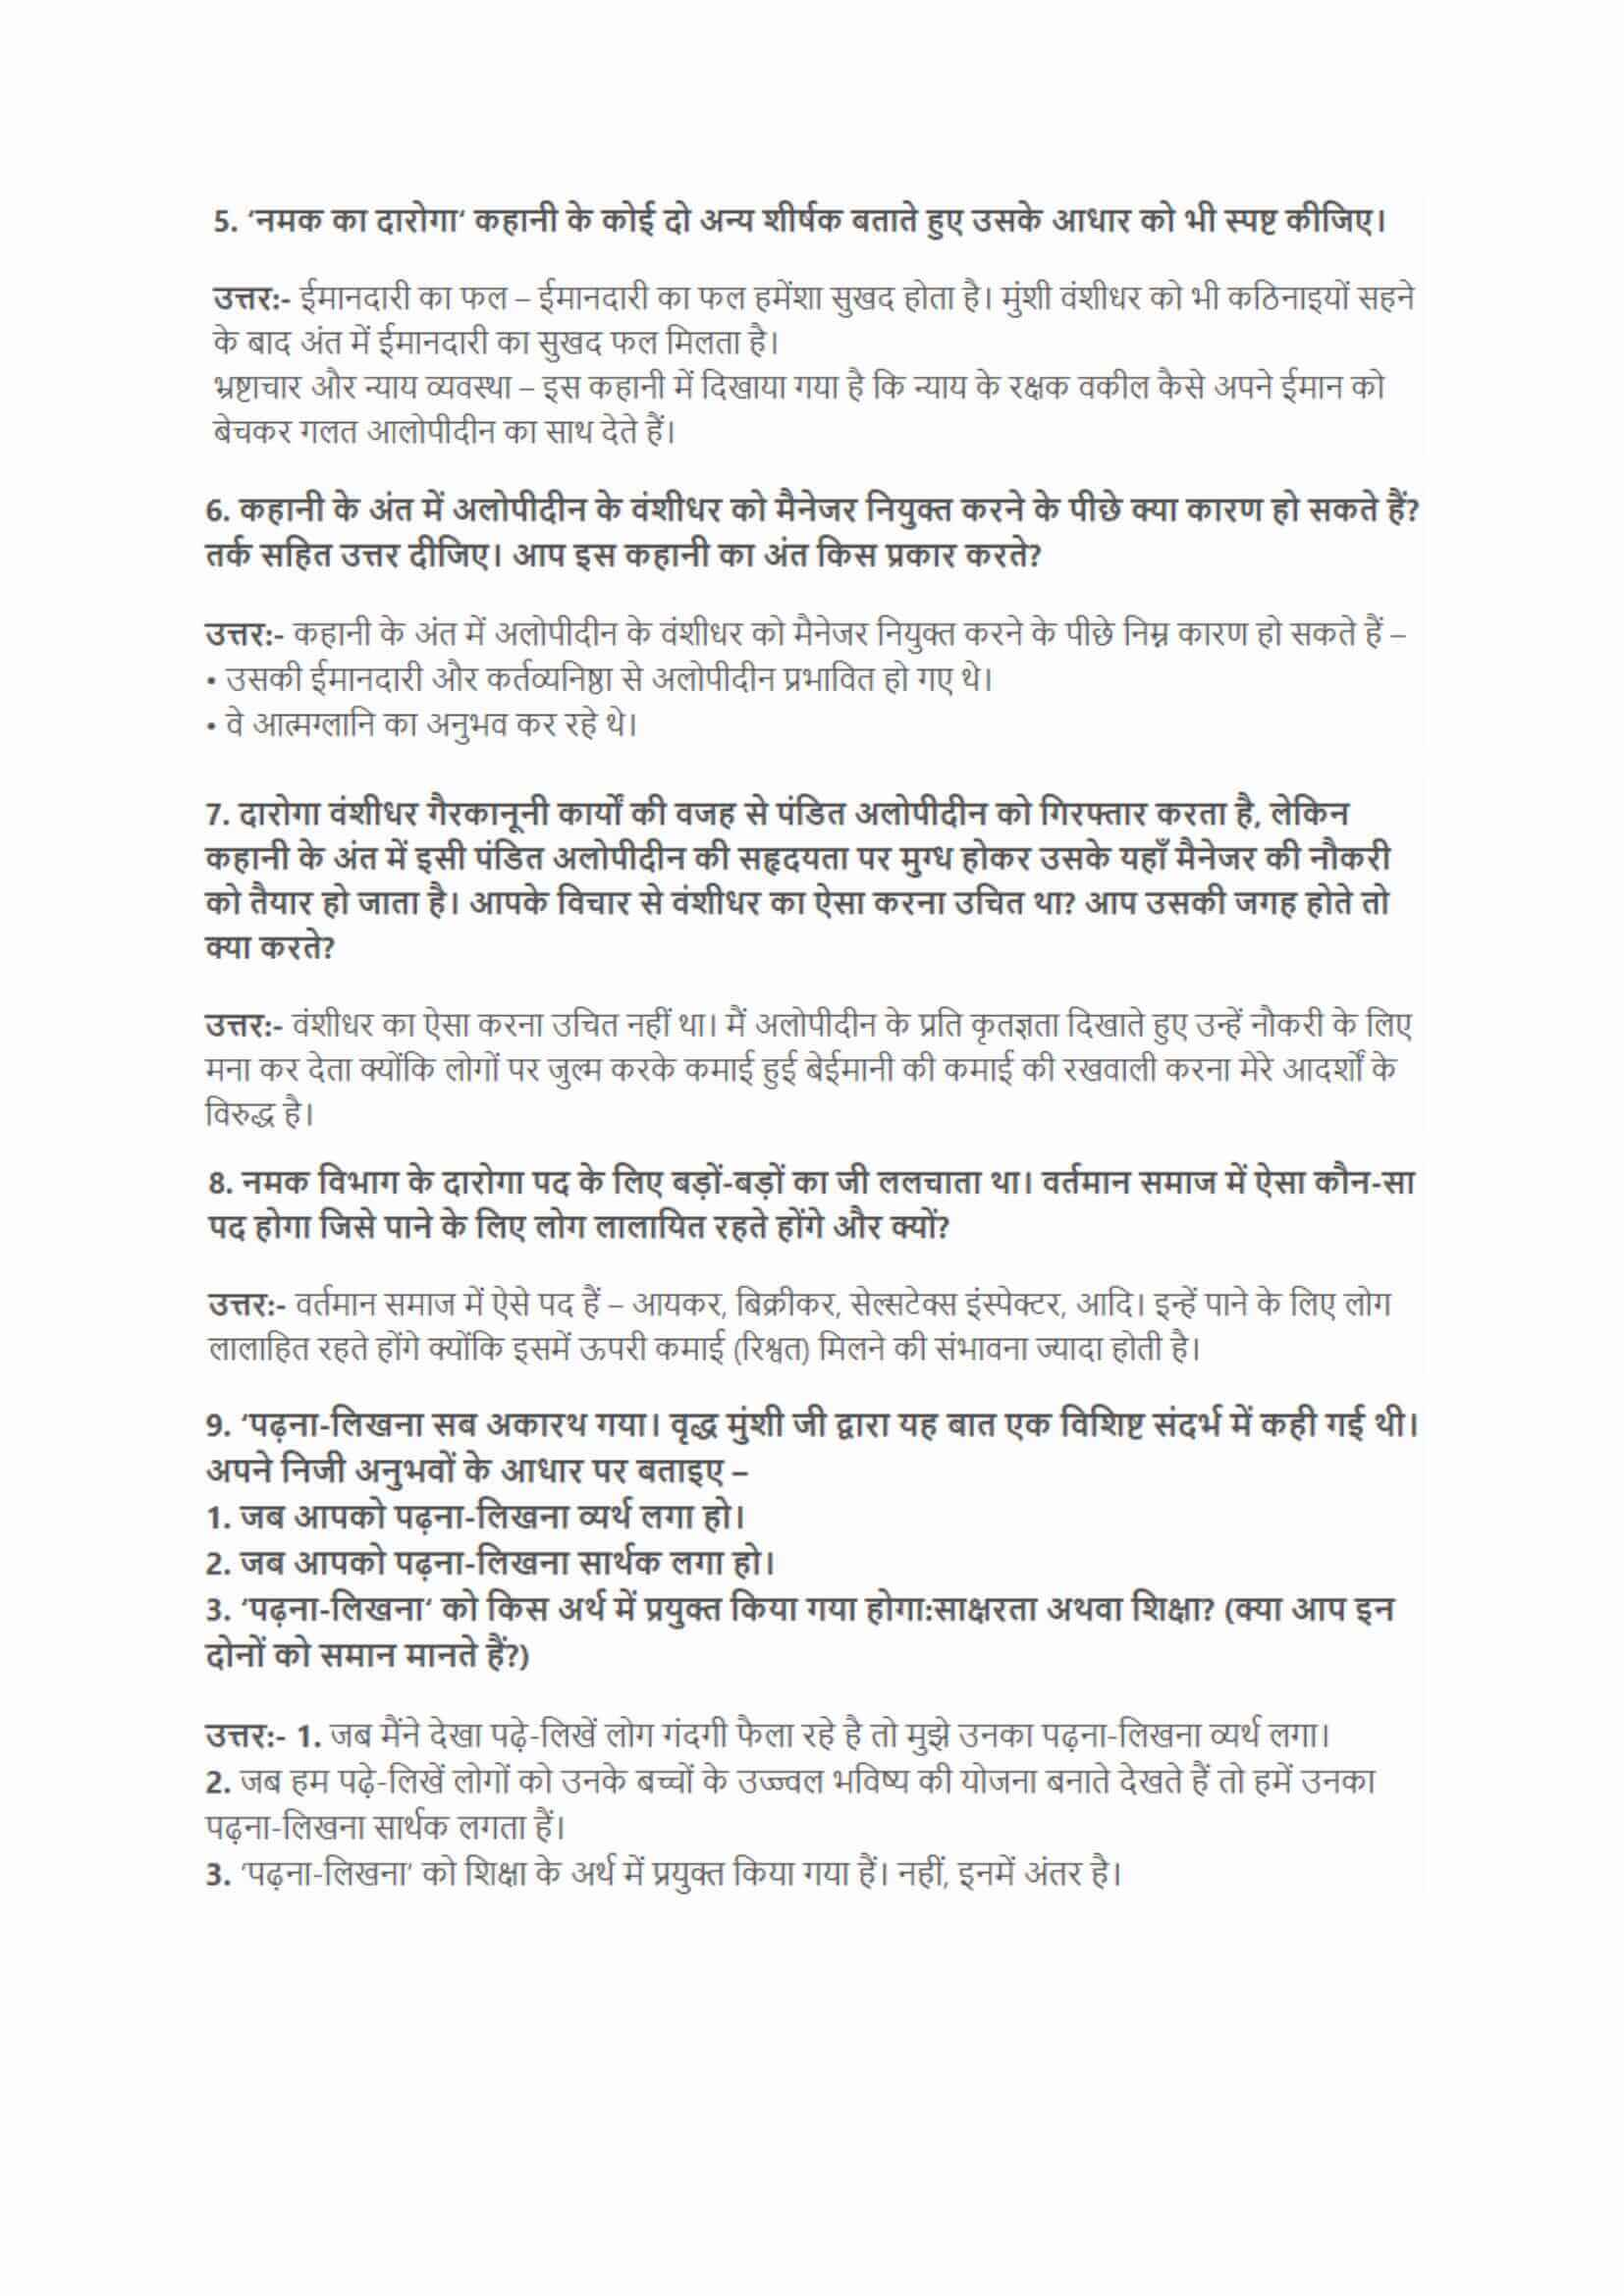 NCERT Solutions Class 11 Hindi Aroh Chapter 1 - नमक का